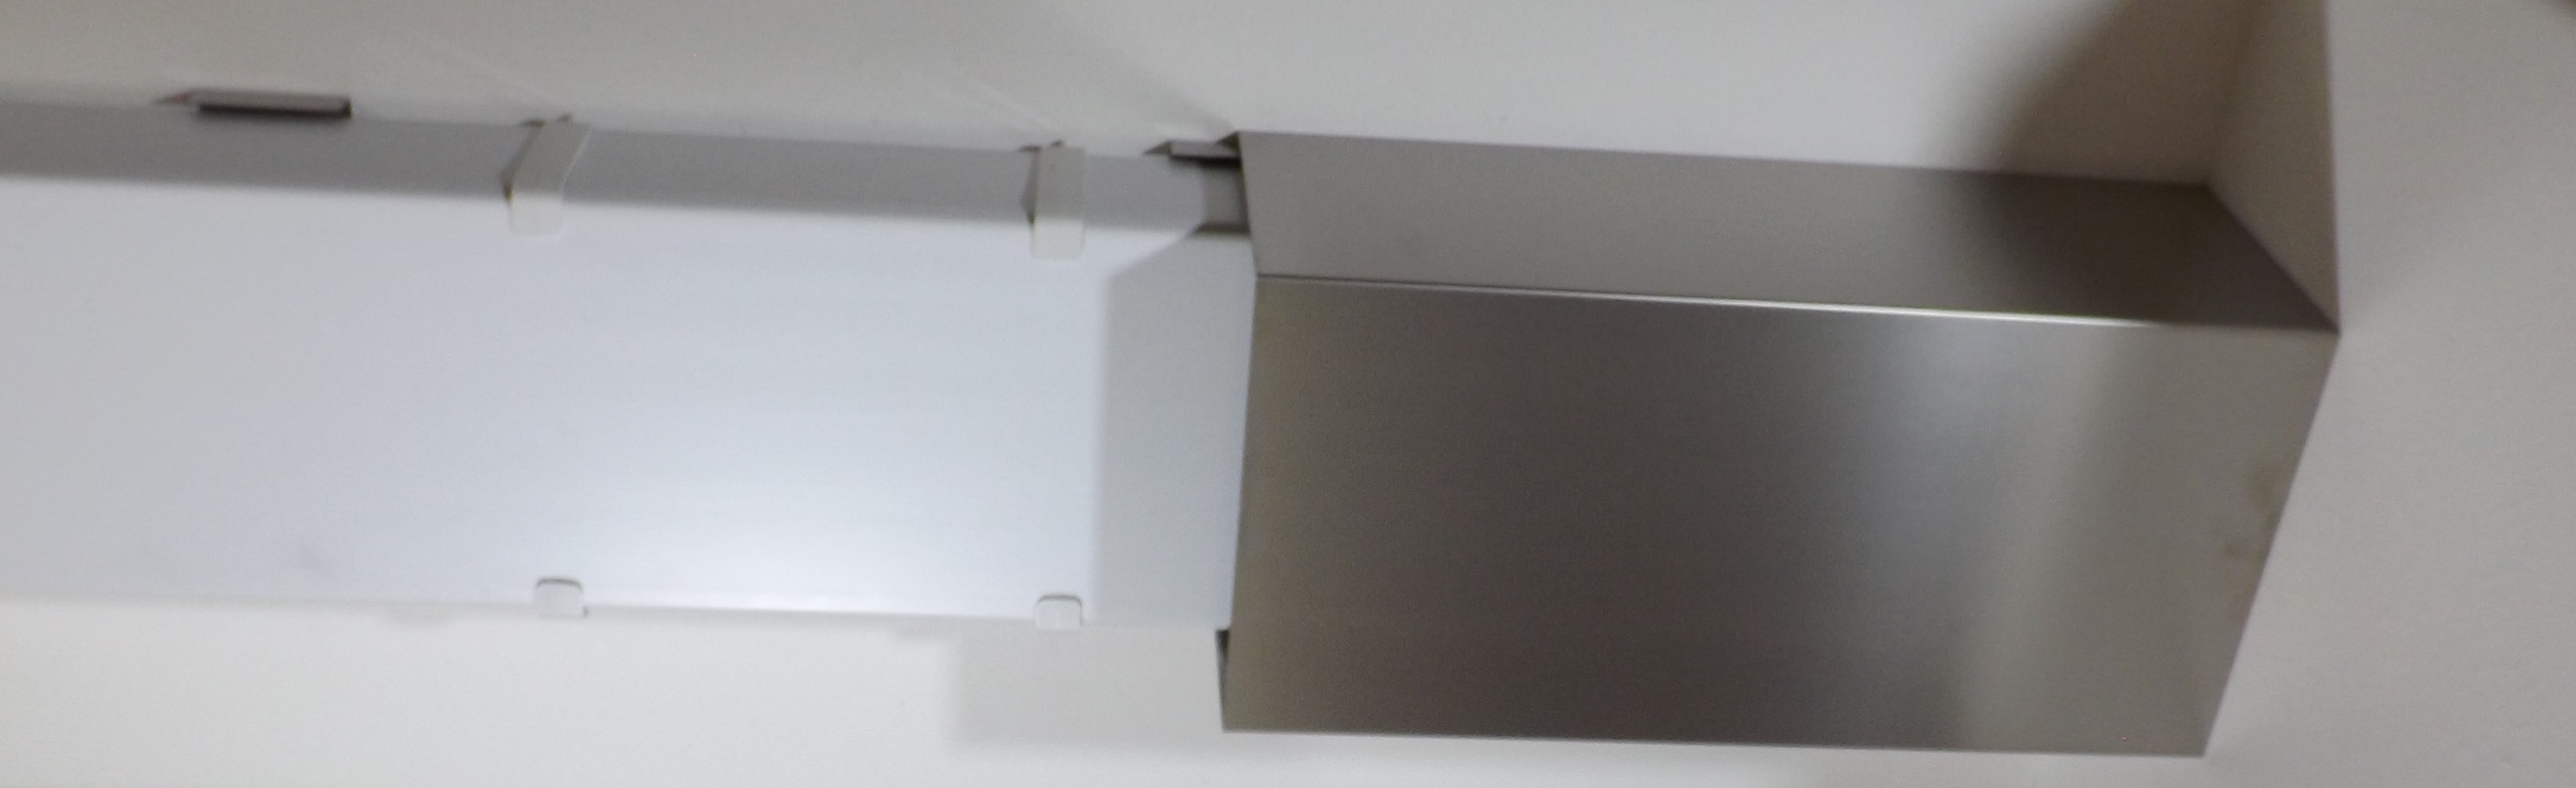 edelstahl verkleidung u form f r flachkanal insel dunstabzugshauben naber compair. Black Bedroom Furniture Sets. Home Design Ideas